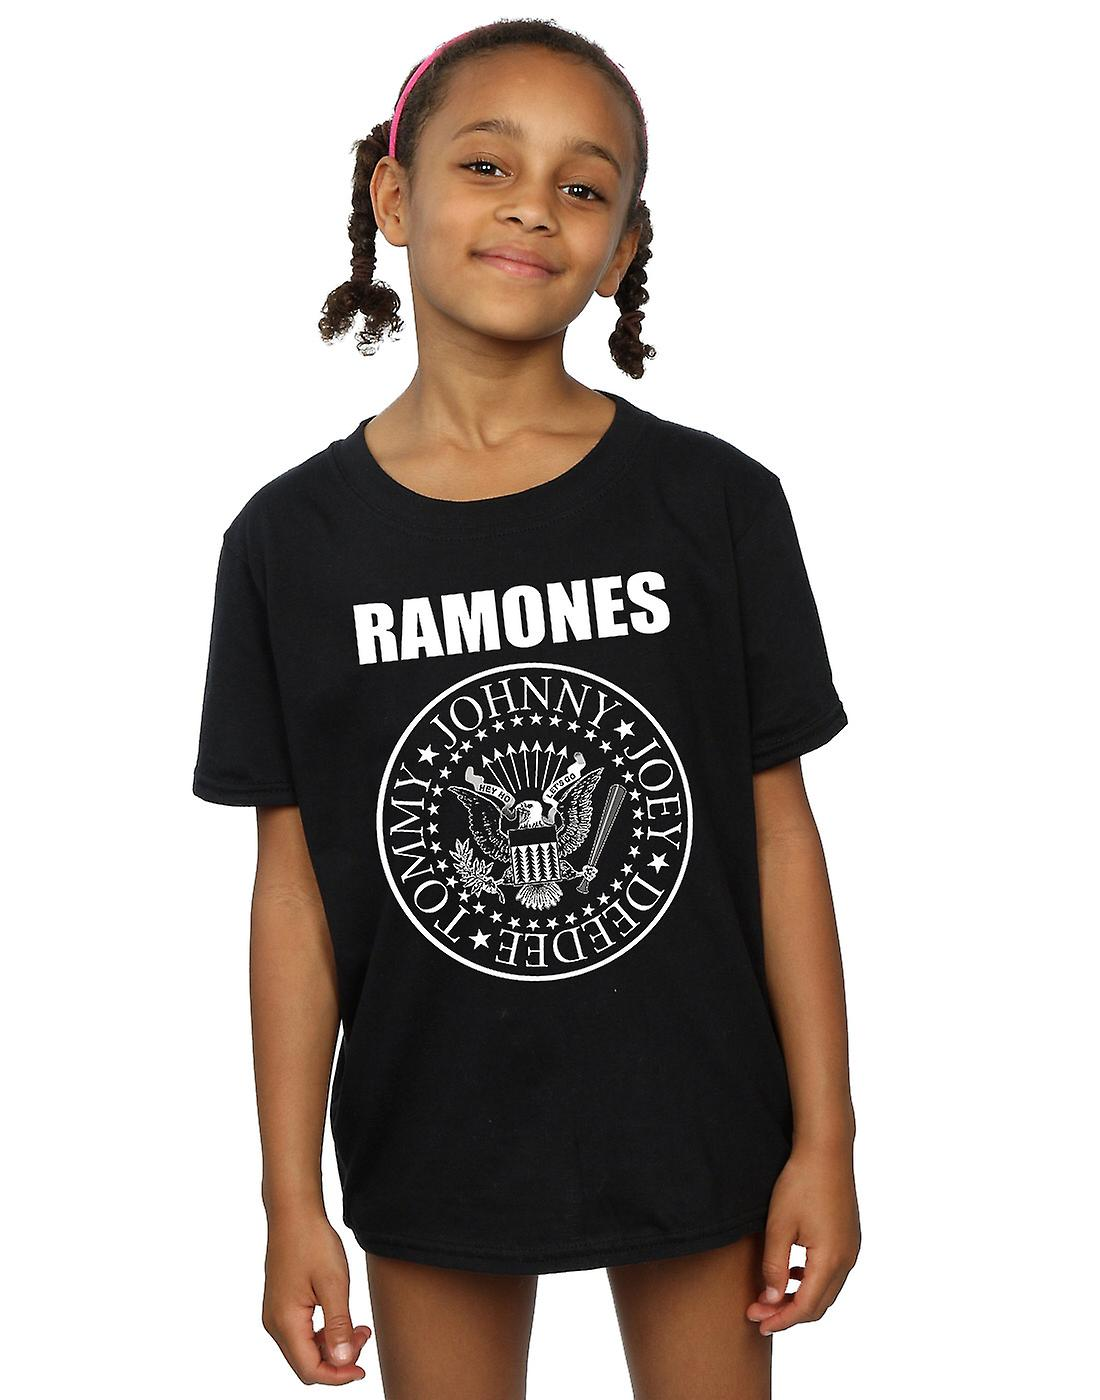 Ramones Girls Presidential Seal T-Shirt